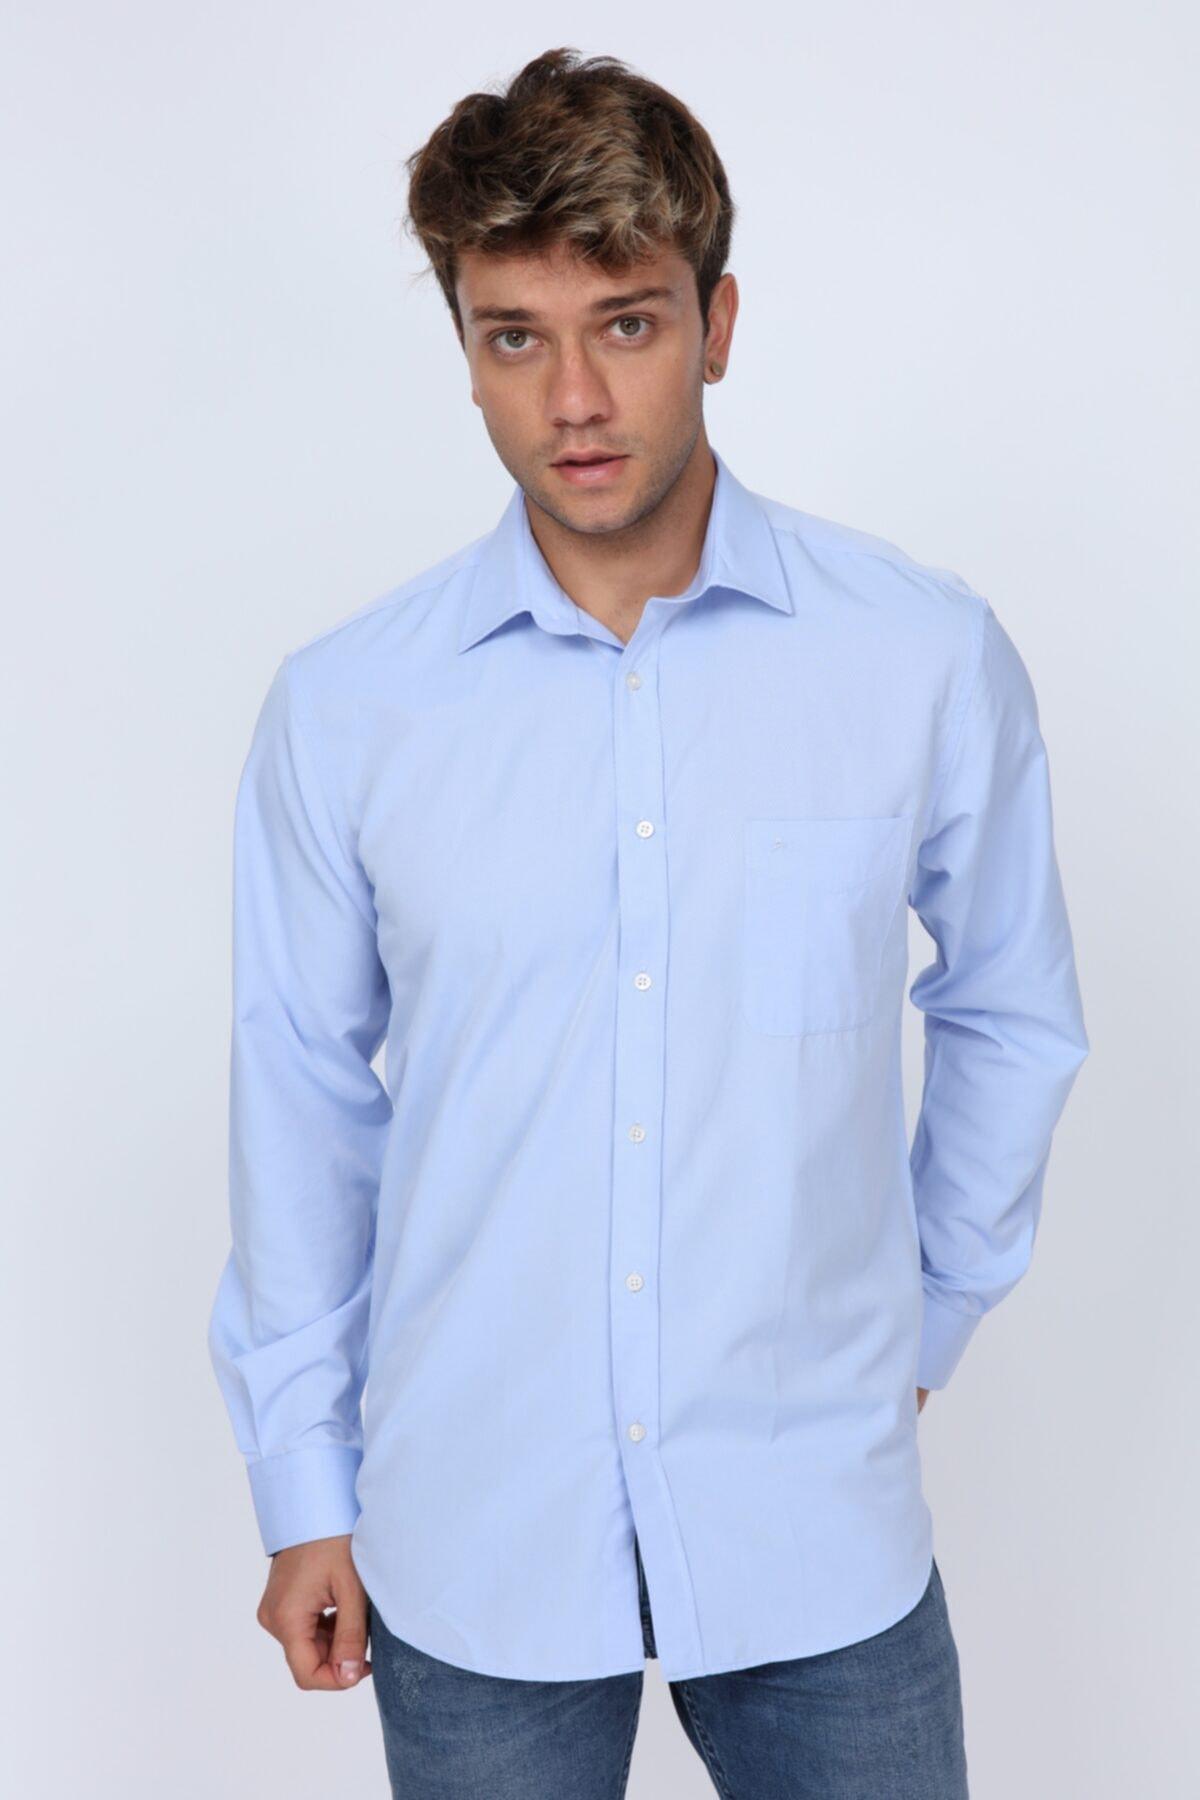 Abbate Erkek Açık Mavi  Club Kumaş Detaylı Regular Fit Gömlek 1